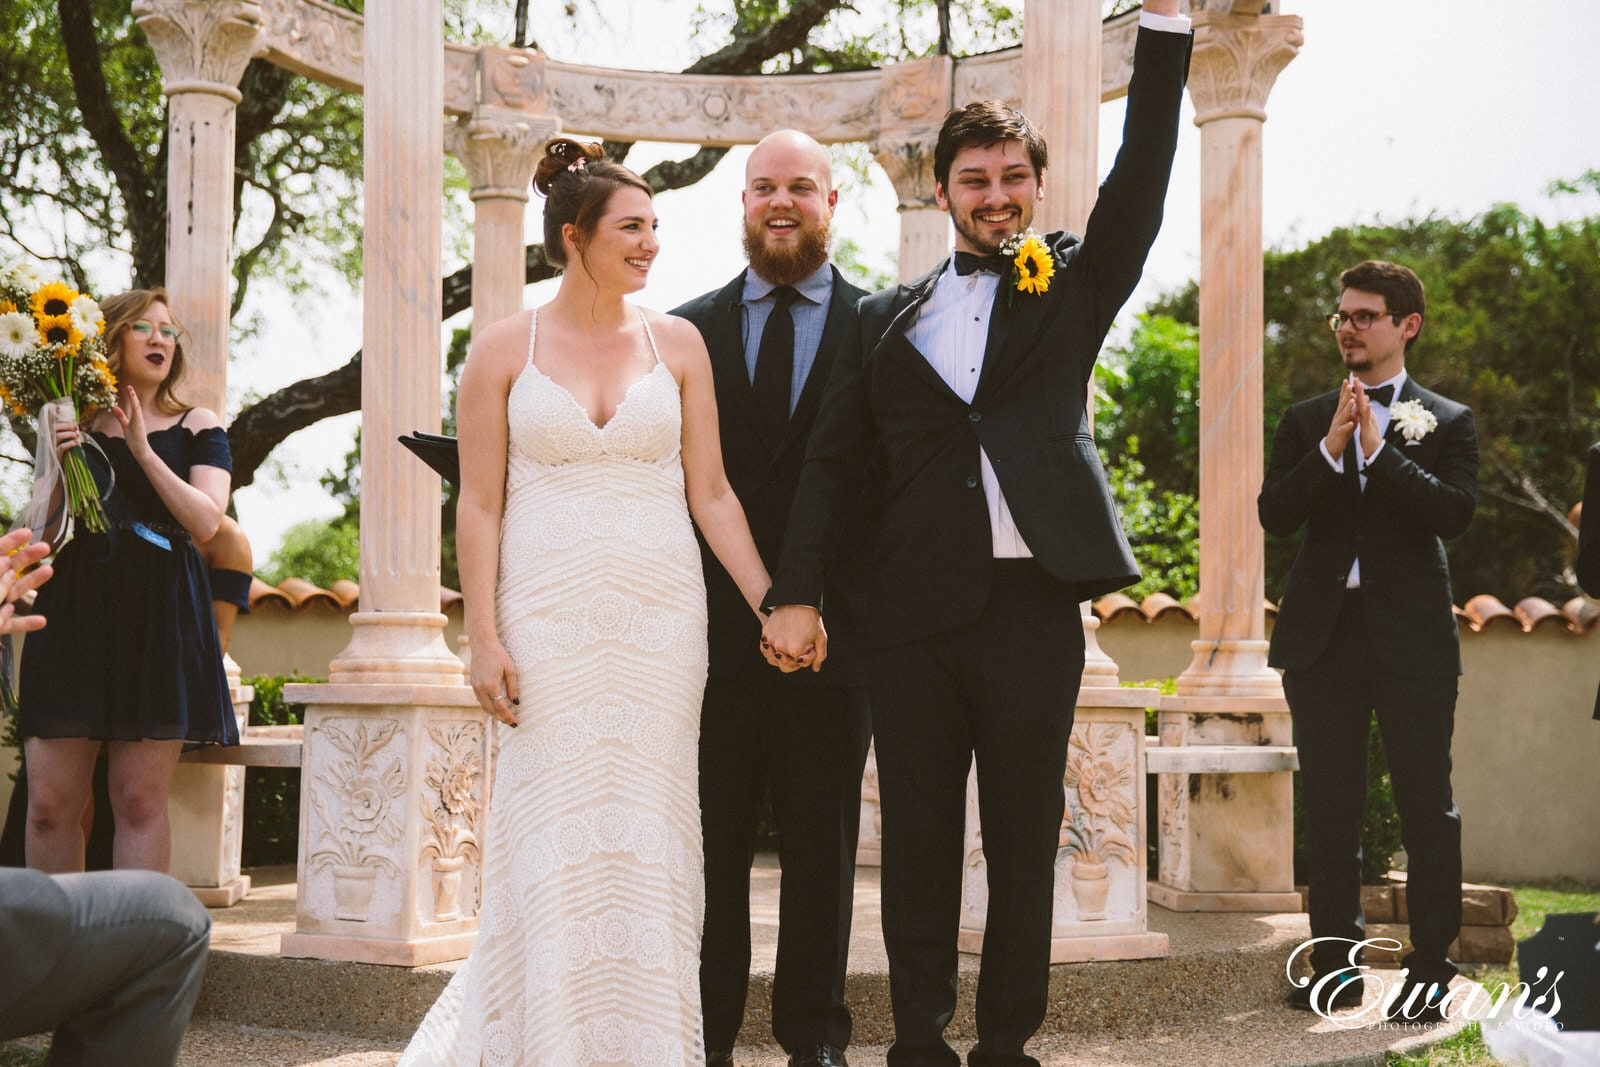 woman in white wedding dress standing beside man in black suit